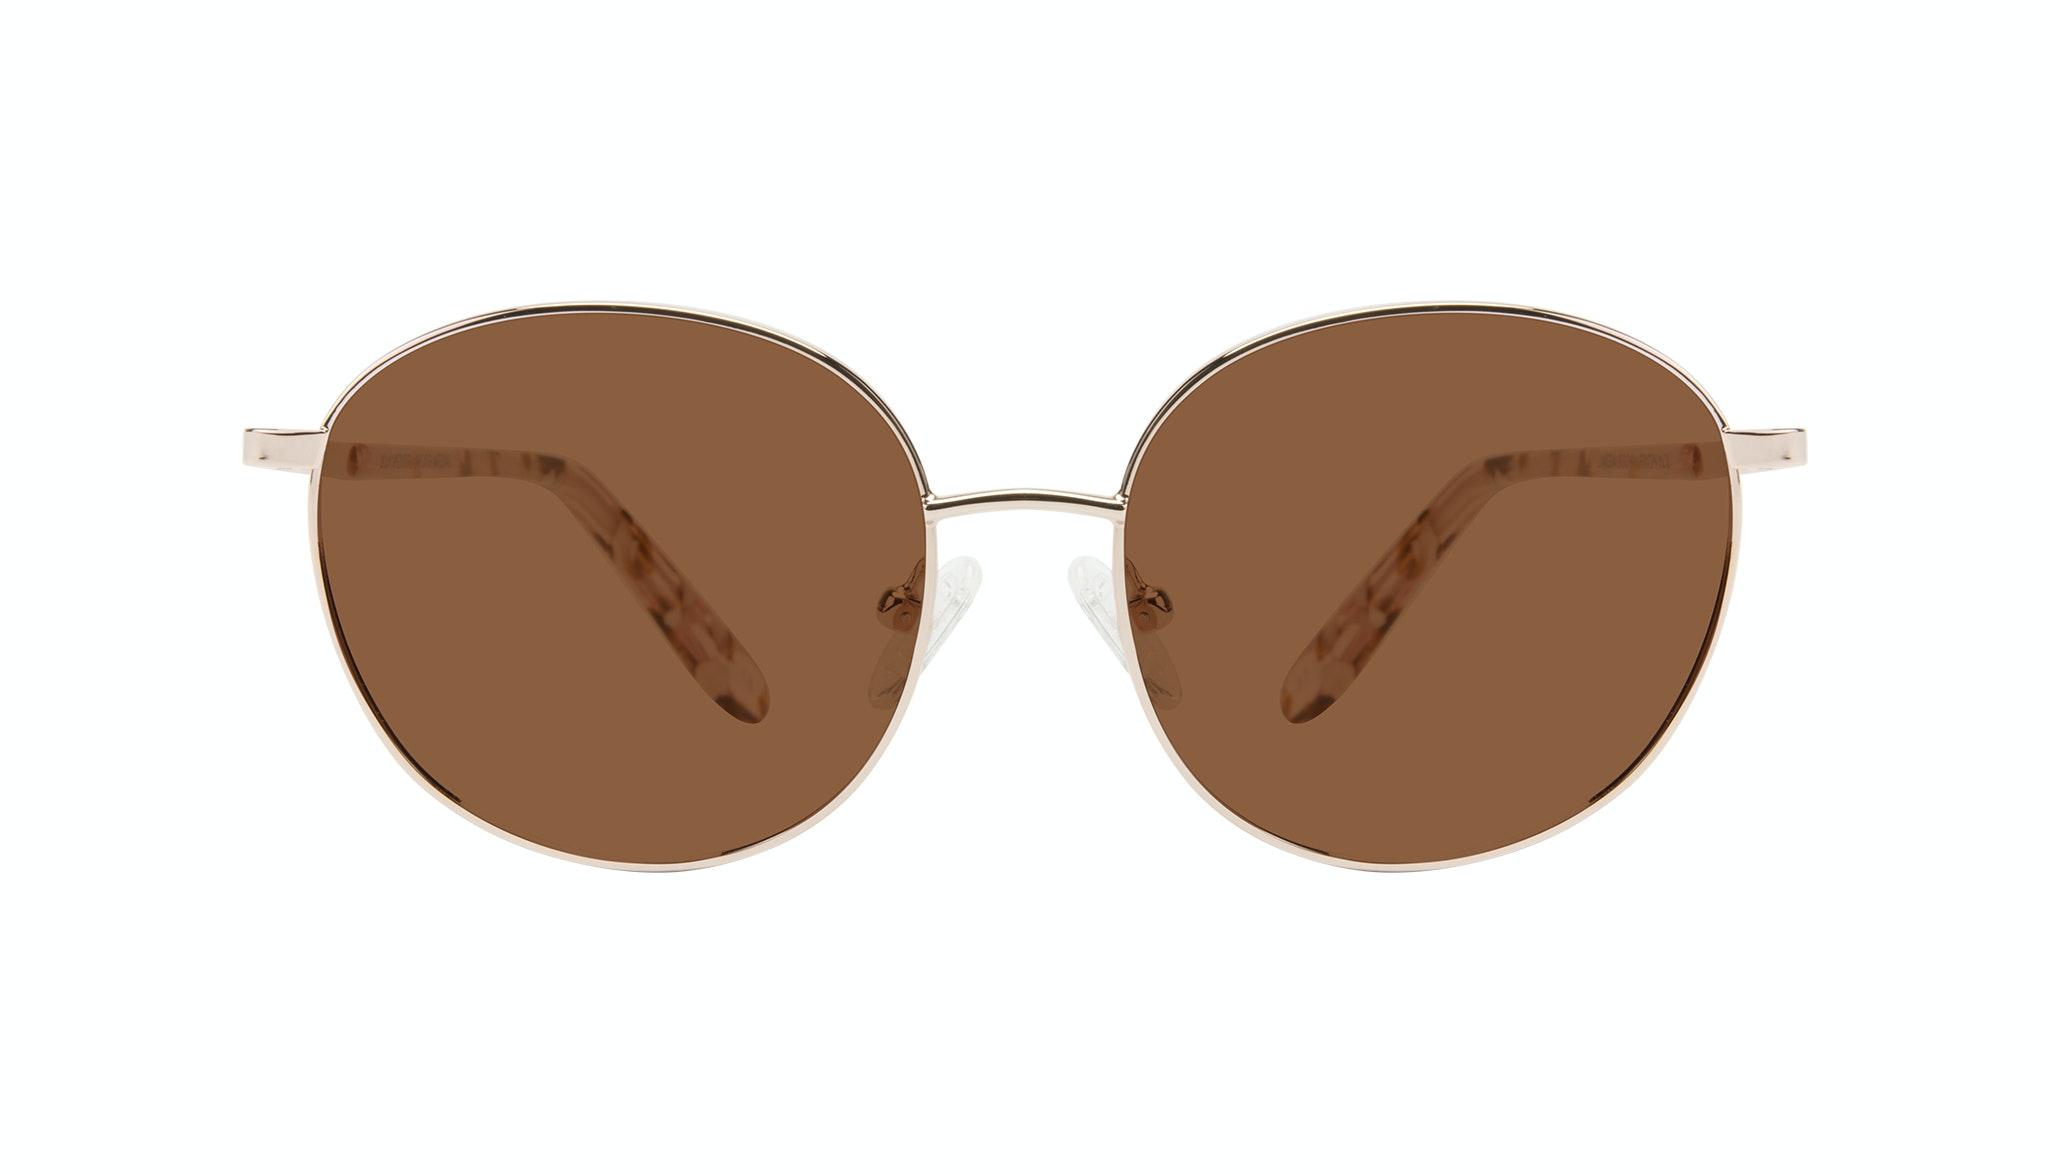 Affordable Fashion Glasses Round Sunglasses Women Joy Petite Rose Metal